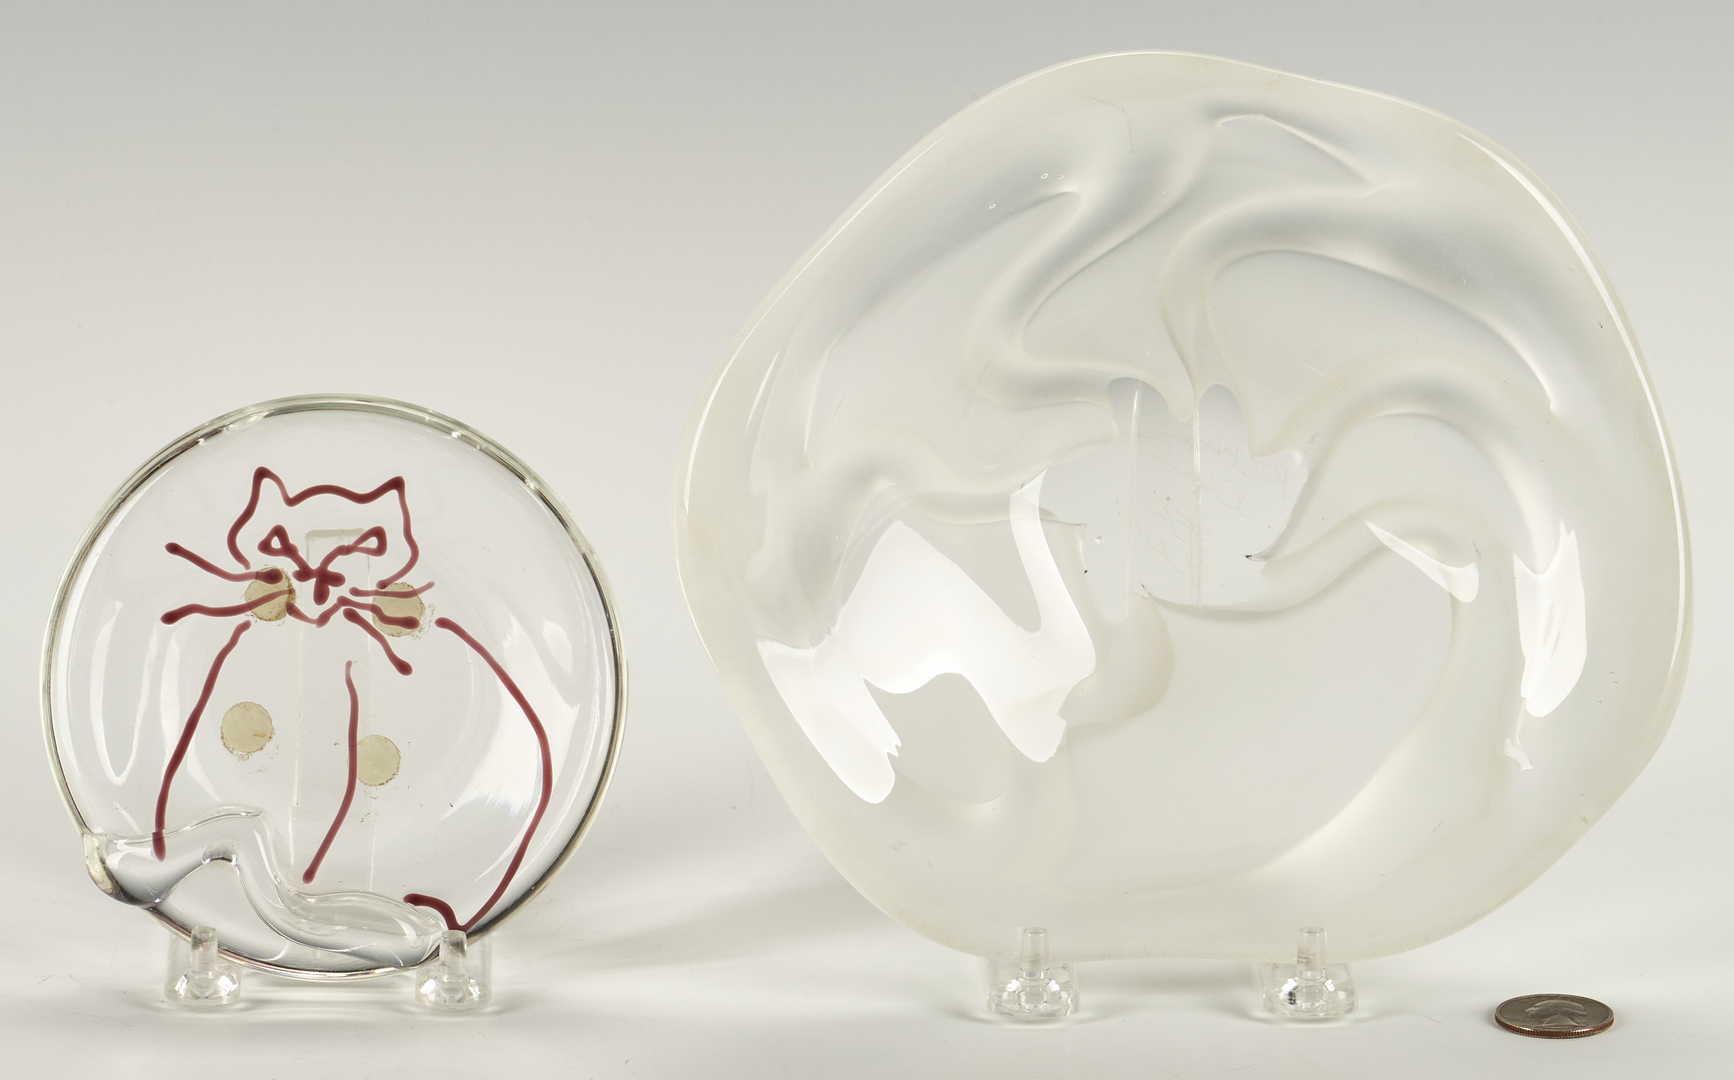 Lot 489: 3 Art Glass Items, incl. Richard Jolley, Tommie Rush